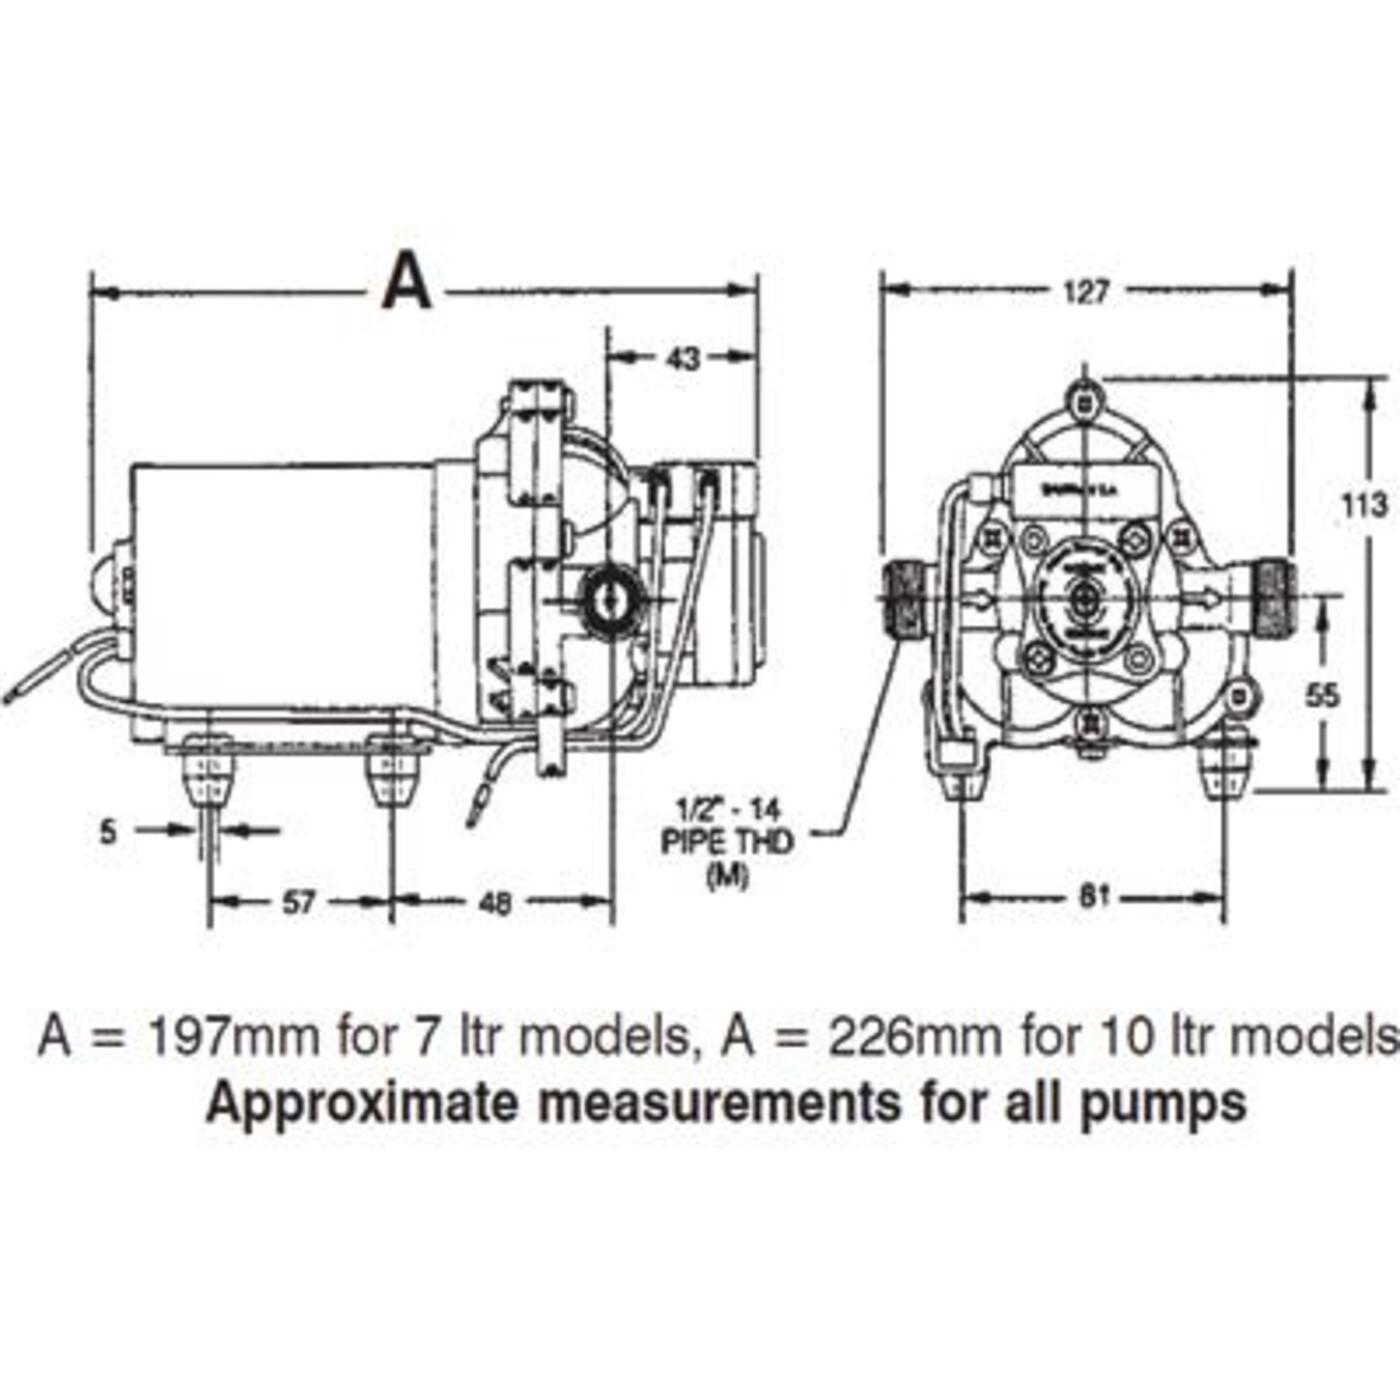 Wiring Harness Jobs In Uk : Wiring harness jobs in uk nakamichi diagram